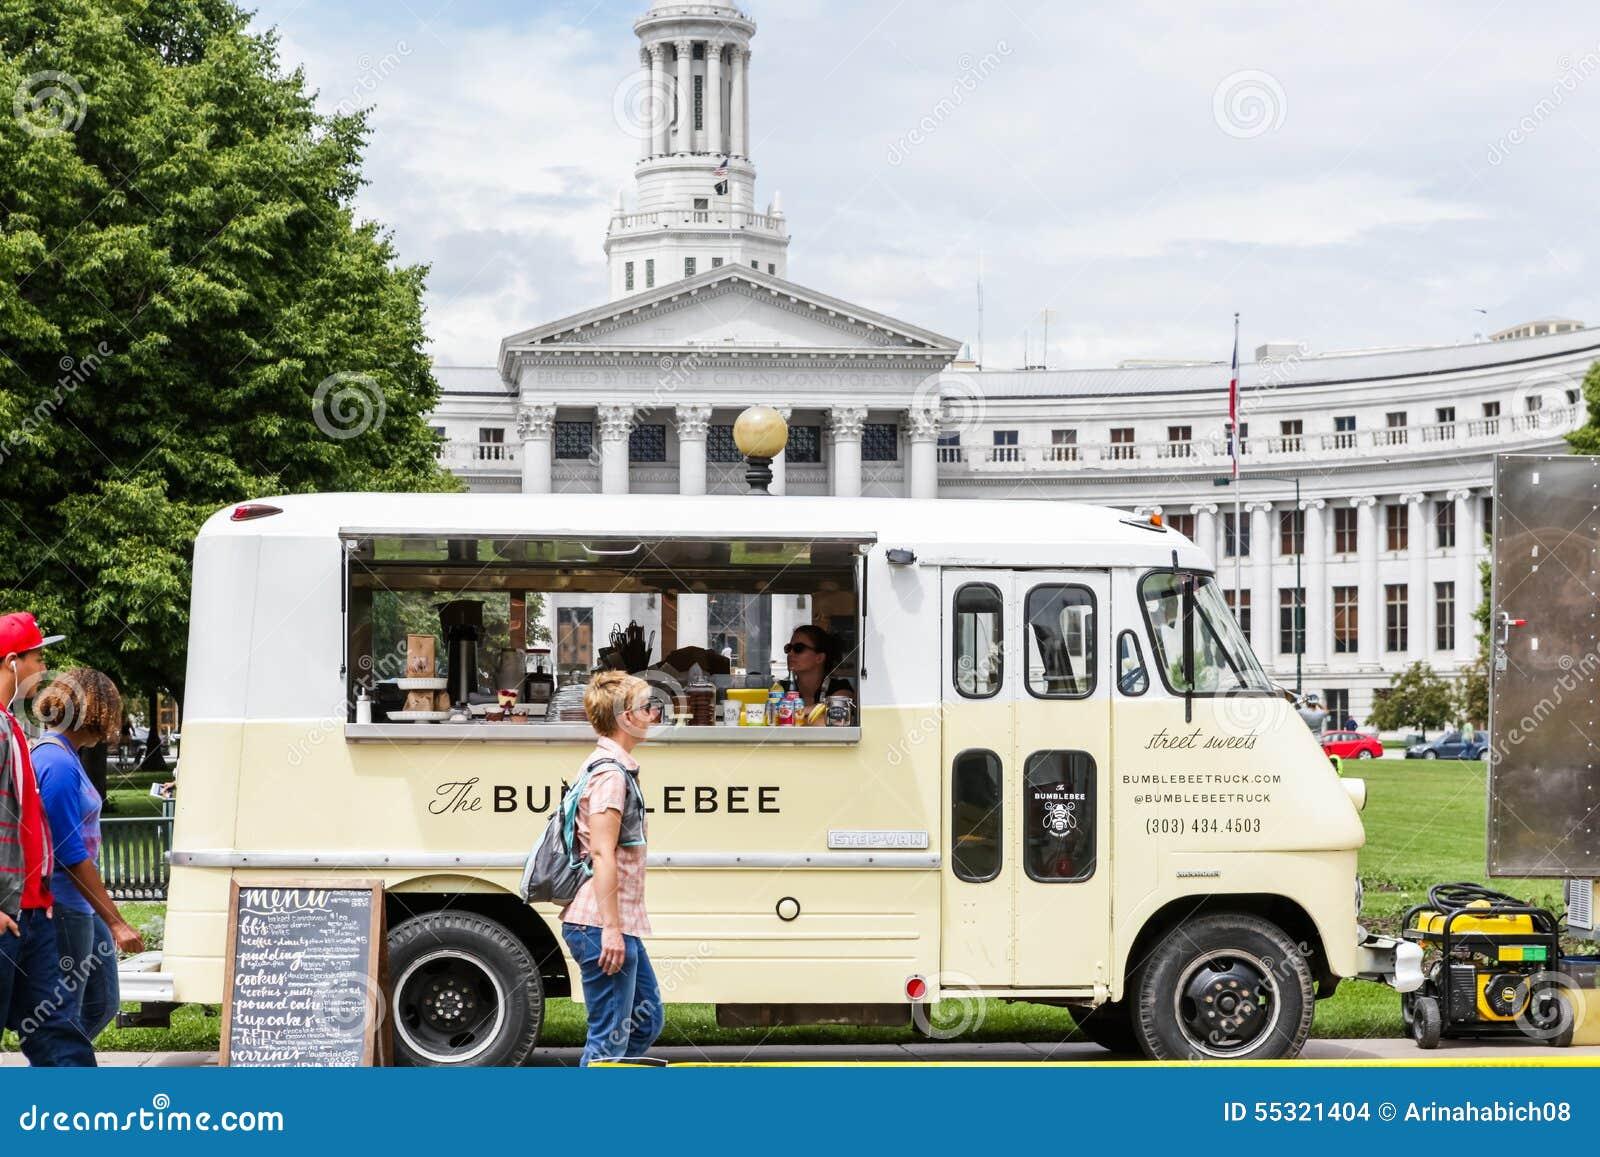 Food Trucks Downtown Denver